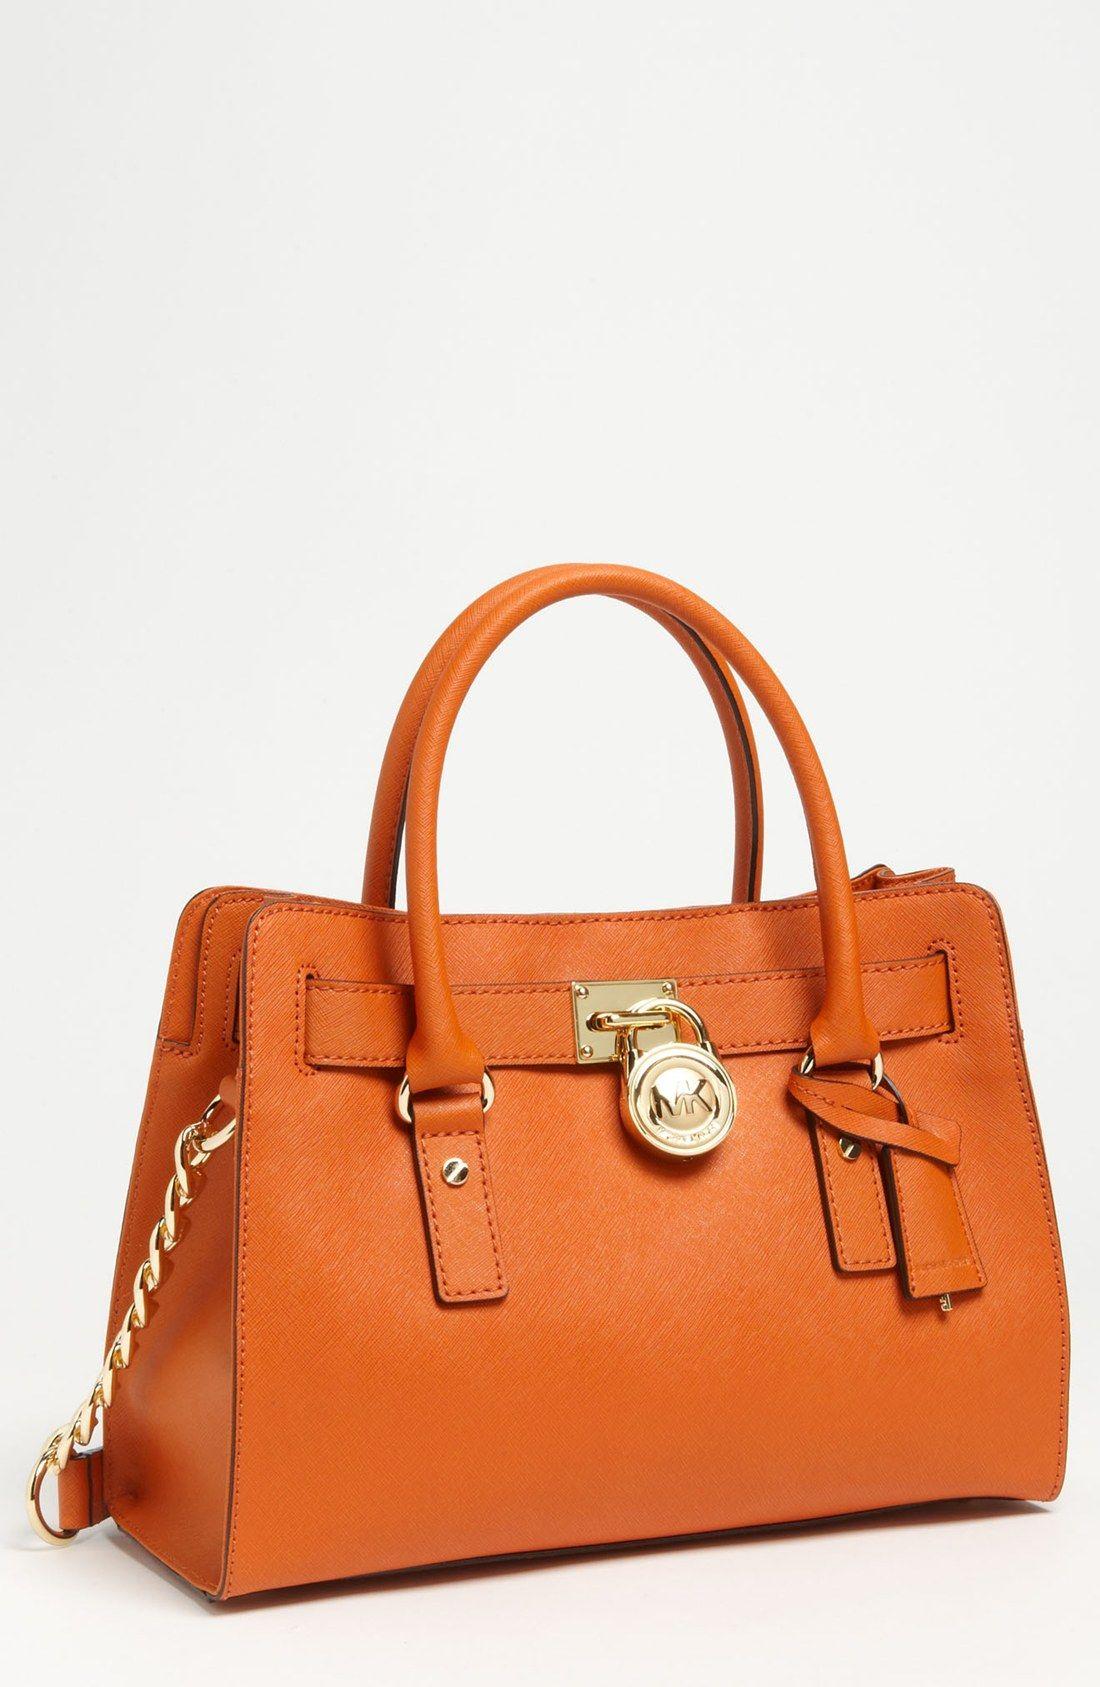 445fa3d9721f Michael michael kors Hamilton Saffiano Leather Satchel in Orange (Luggage)  | Lyst